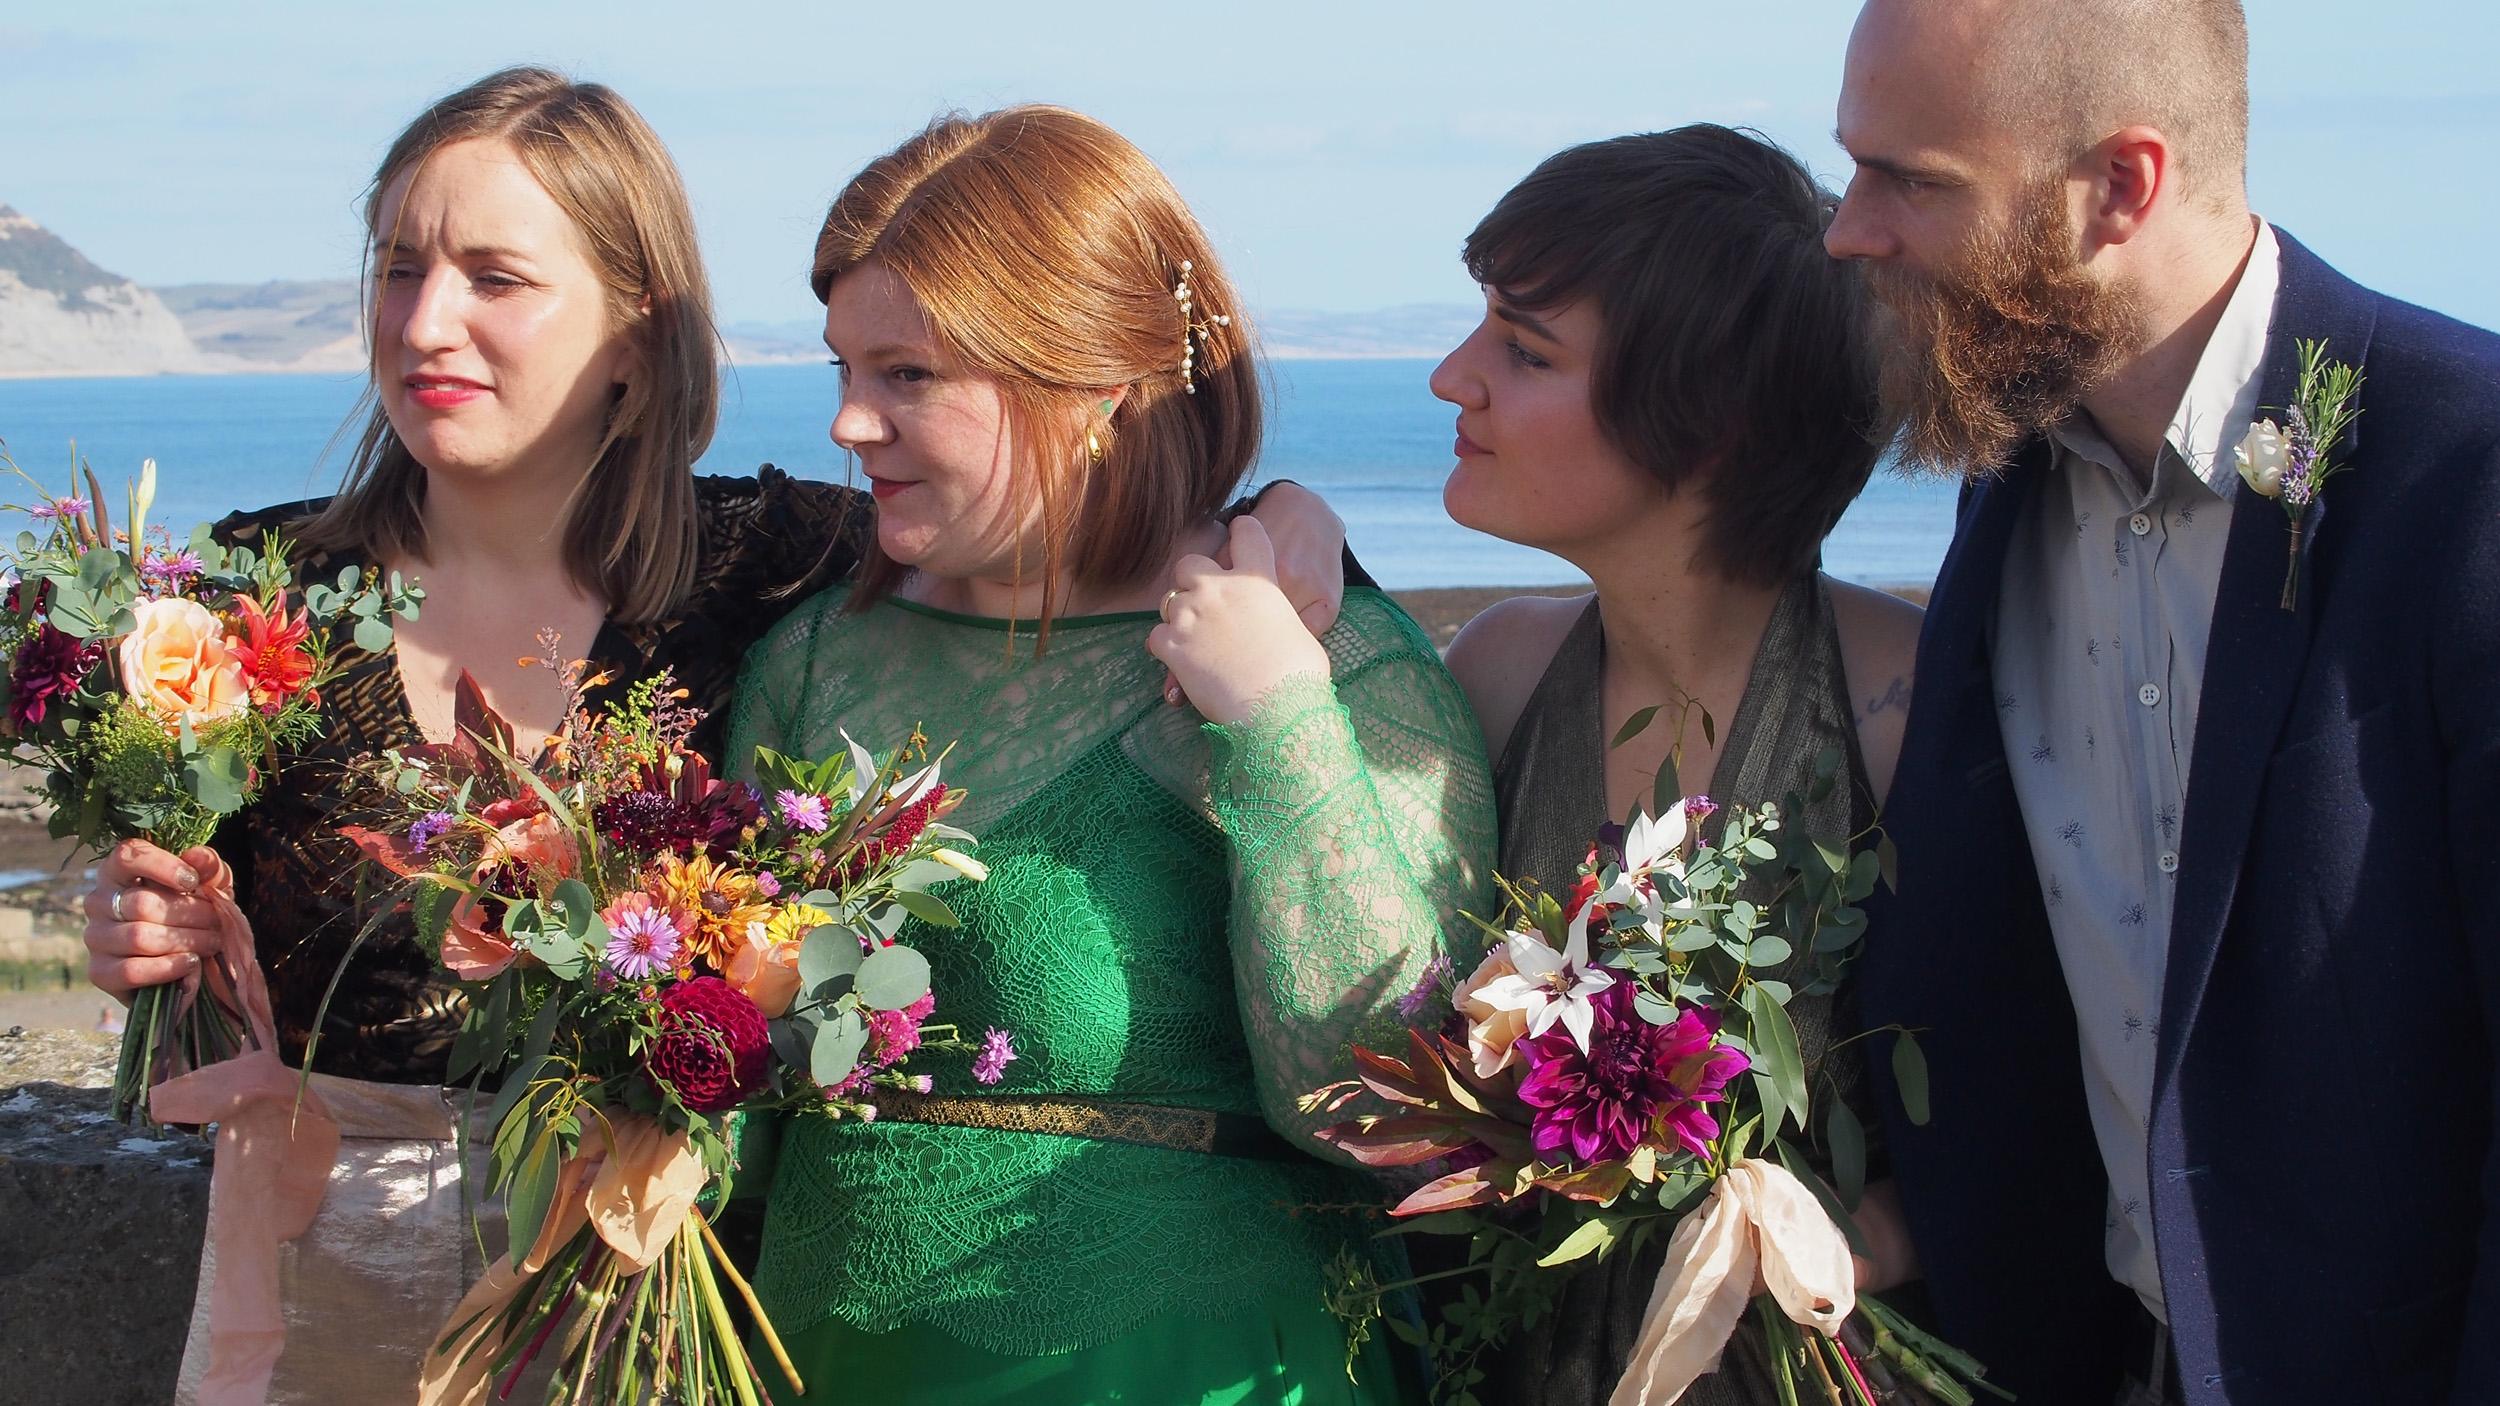 Lucy-Bespoke-Green-Silk-Lace-Wedding-Dress-Kate-Beaumont-Sheffield-a-5.jpg